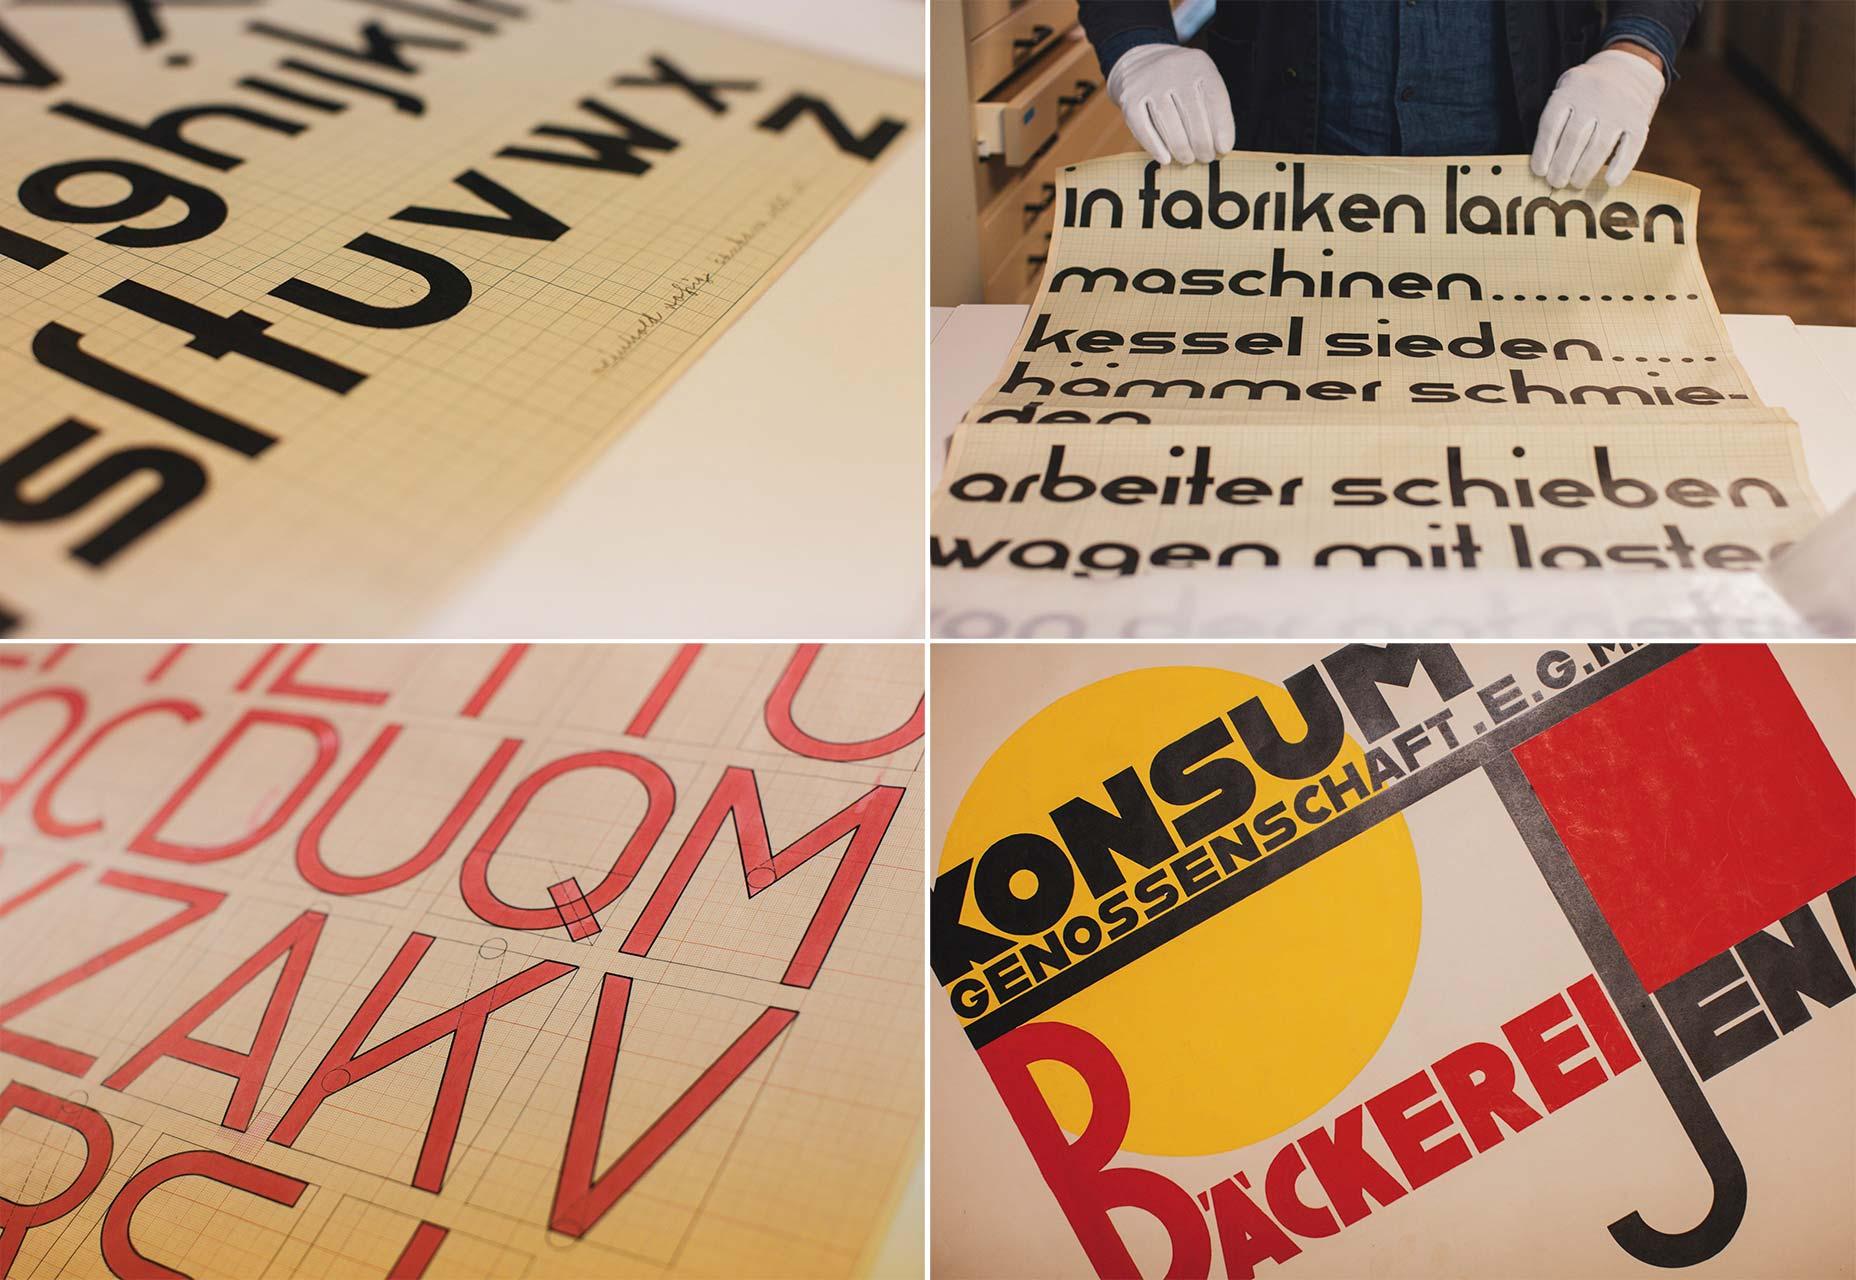 Typekit Announces Bauhaus-Inspired Fonts | Webdesigner Depot